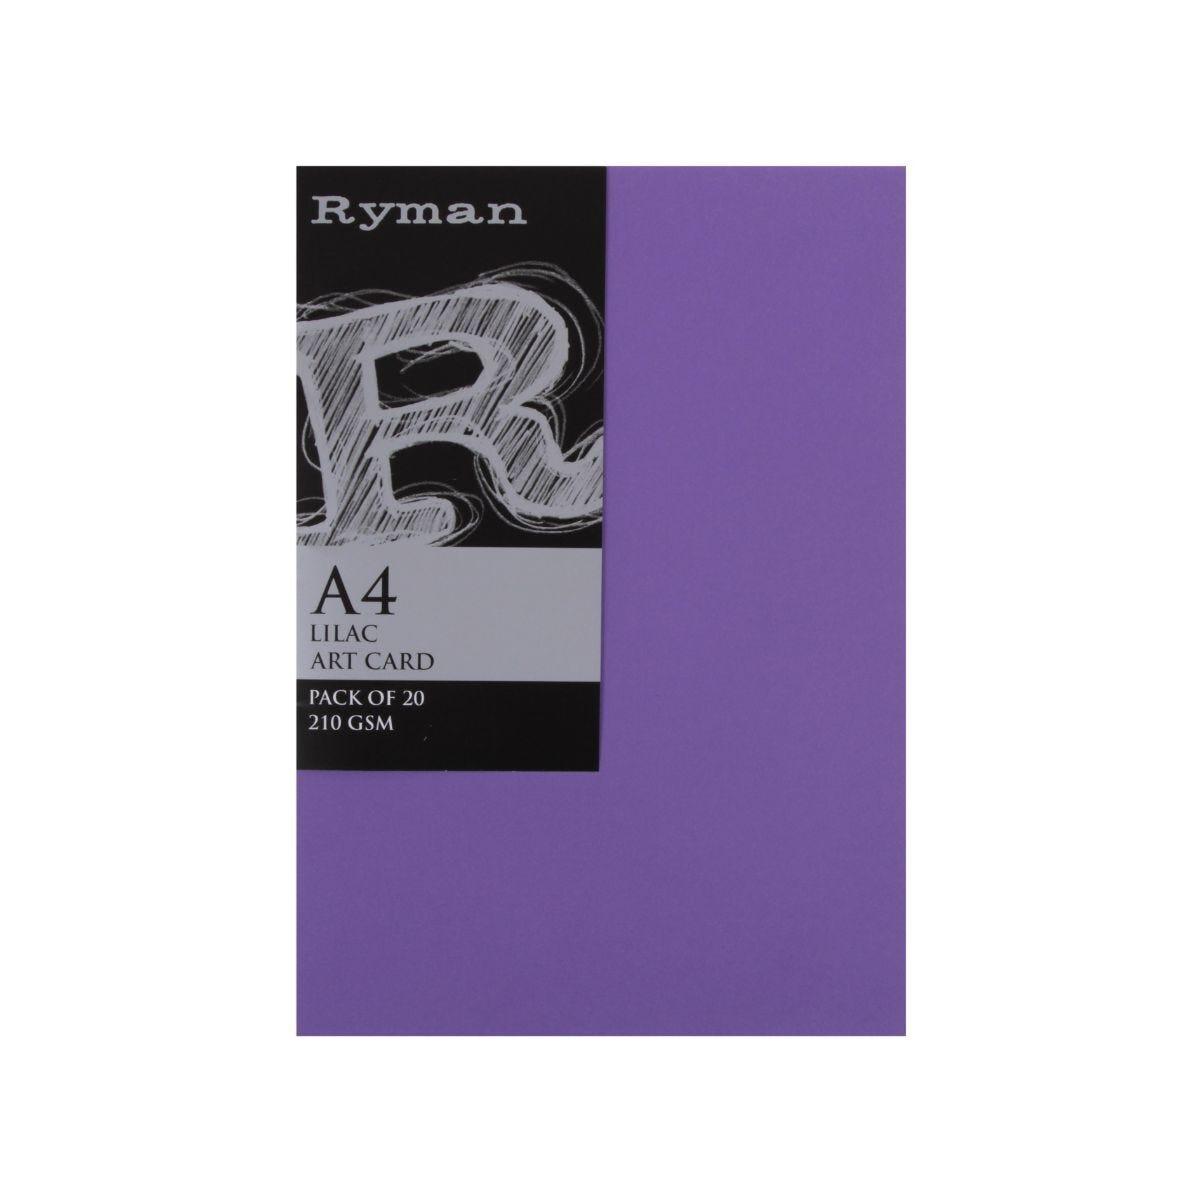 Ryman Artcard A4 210gsm Pack of 20 Lilac